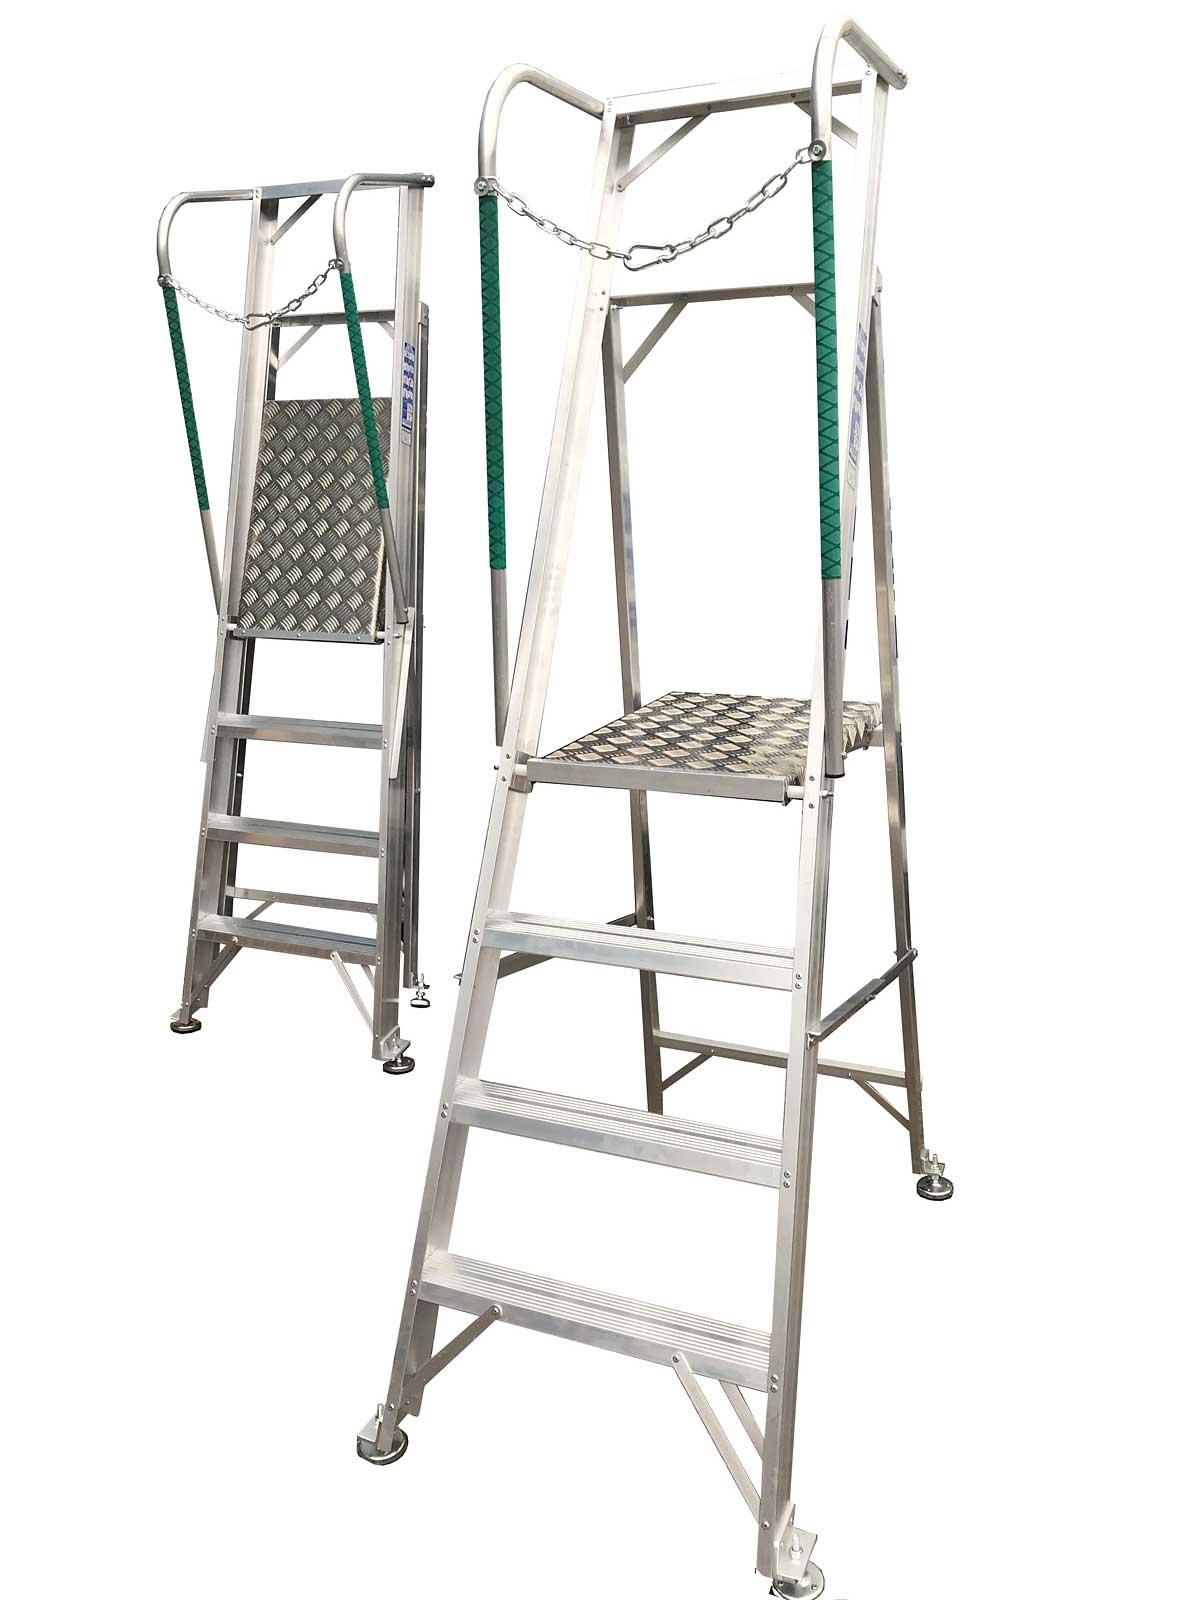 Greenstar Platforms Chase Ladders